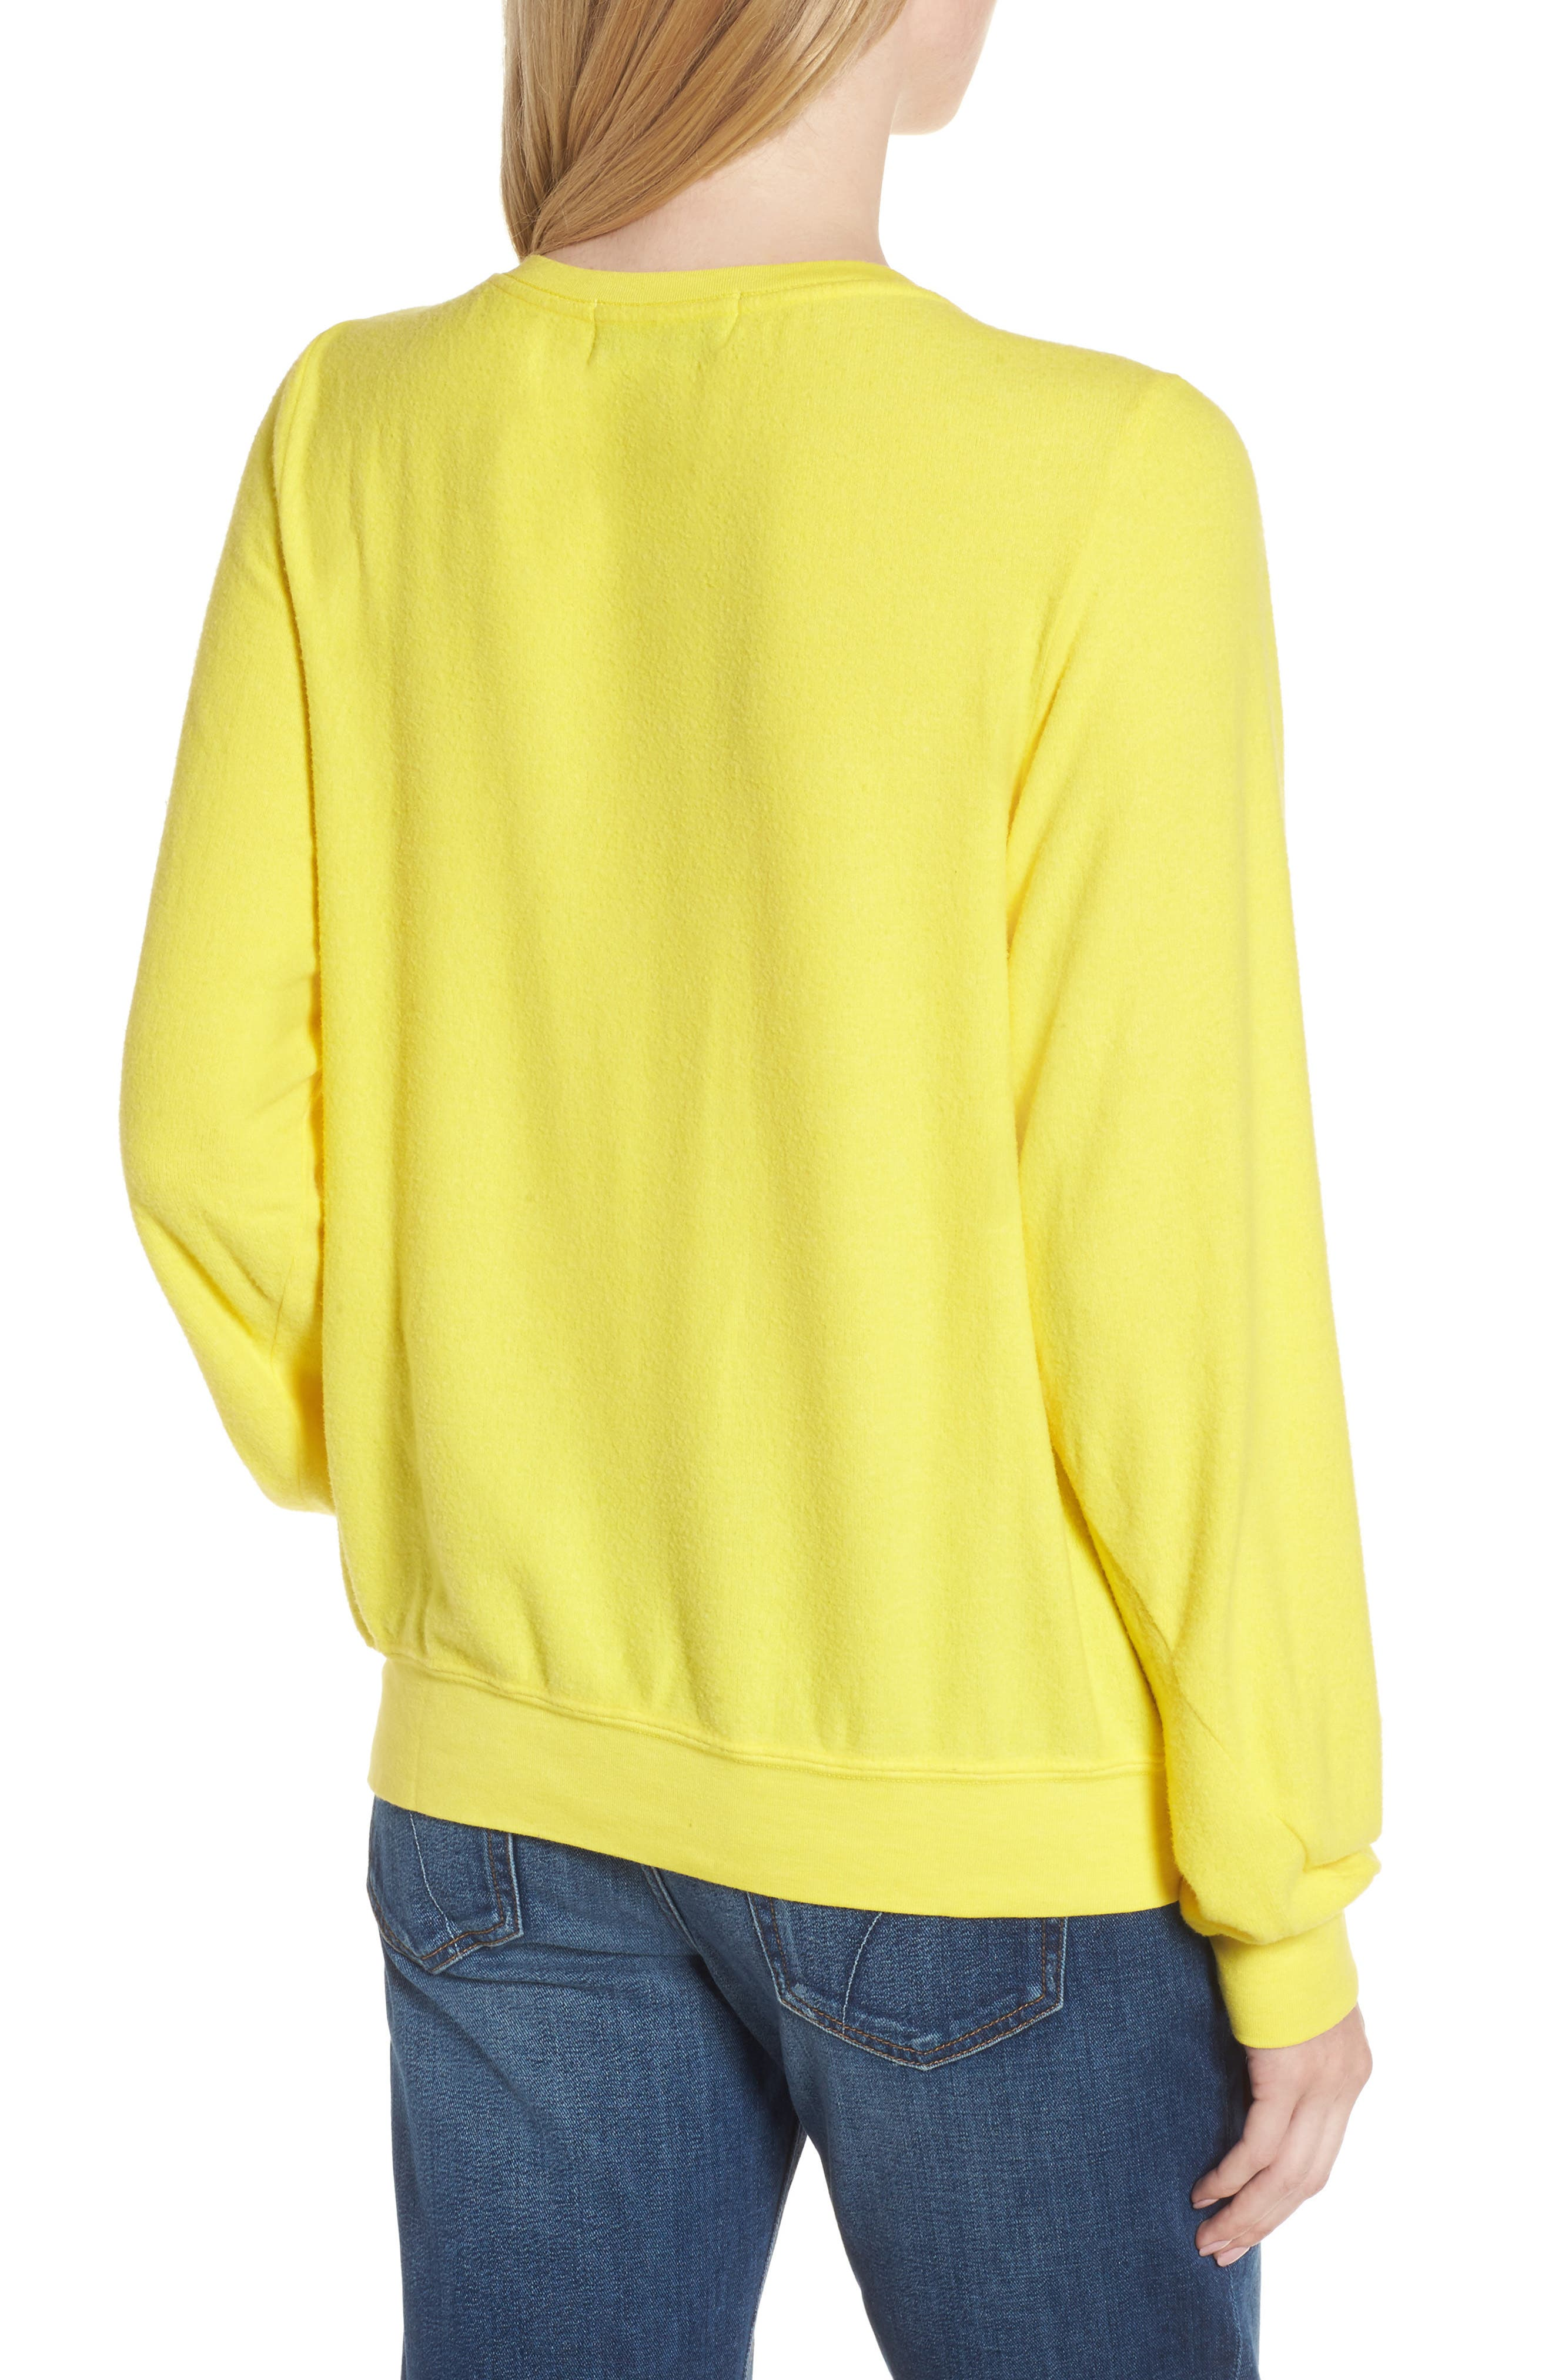 'Somewhere Sunny' Sweatshirt,                             Alternate thumbnail 2, color,                             730